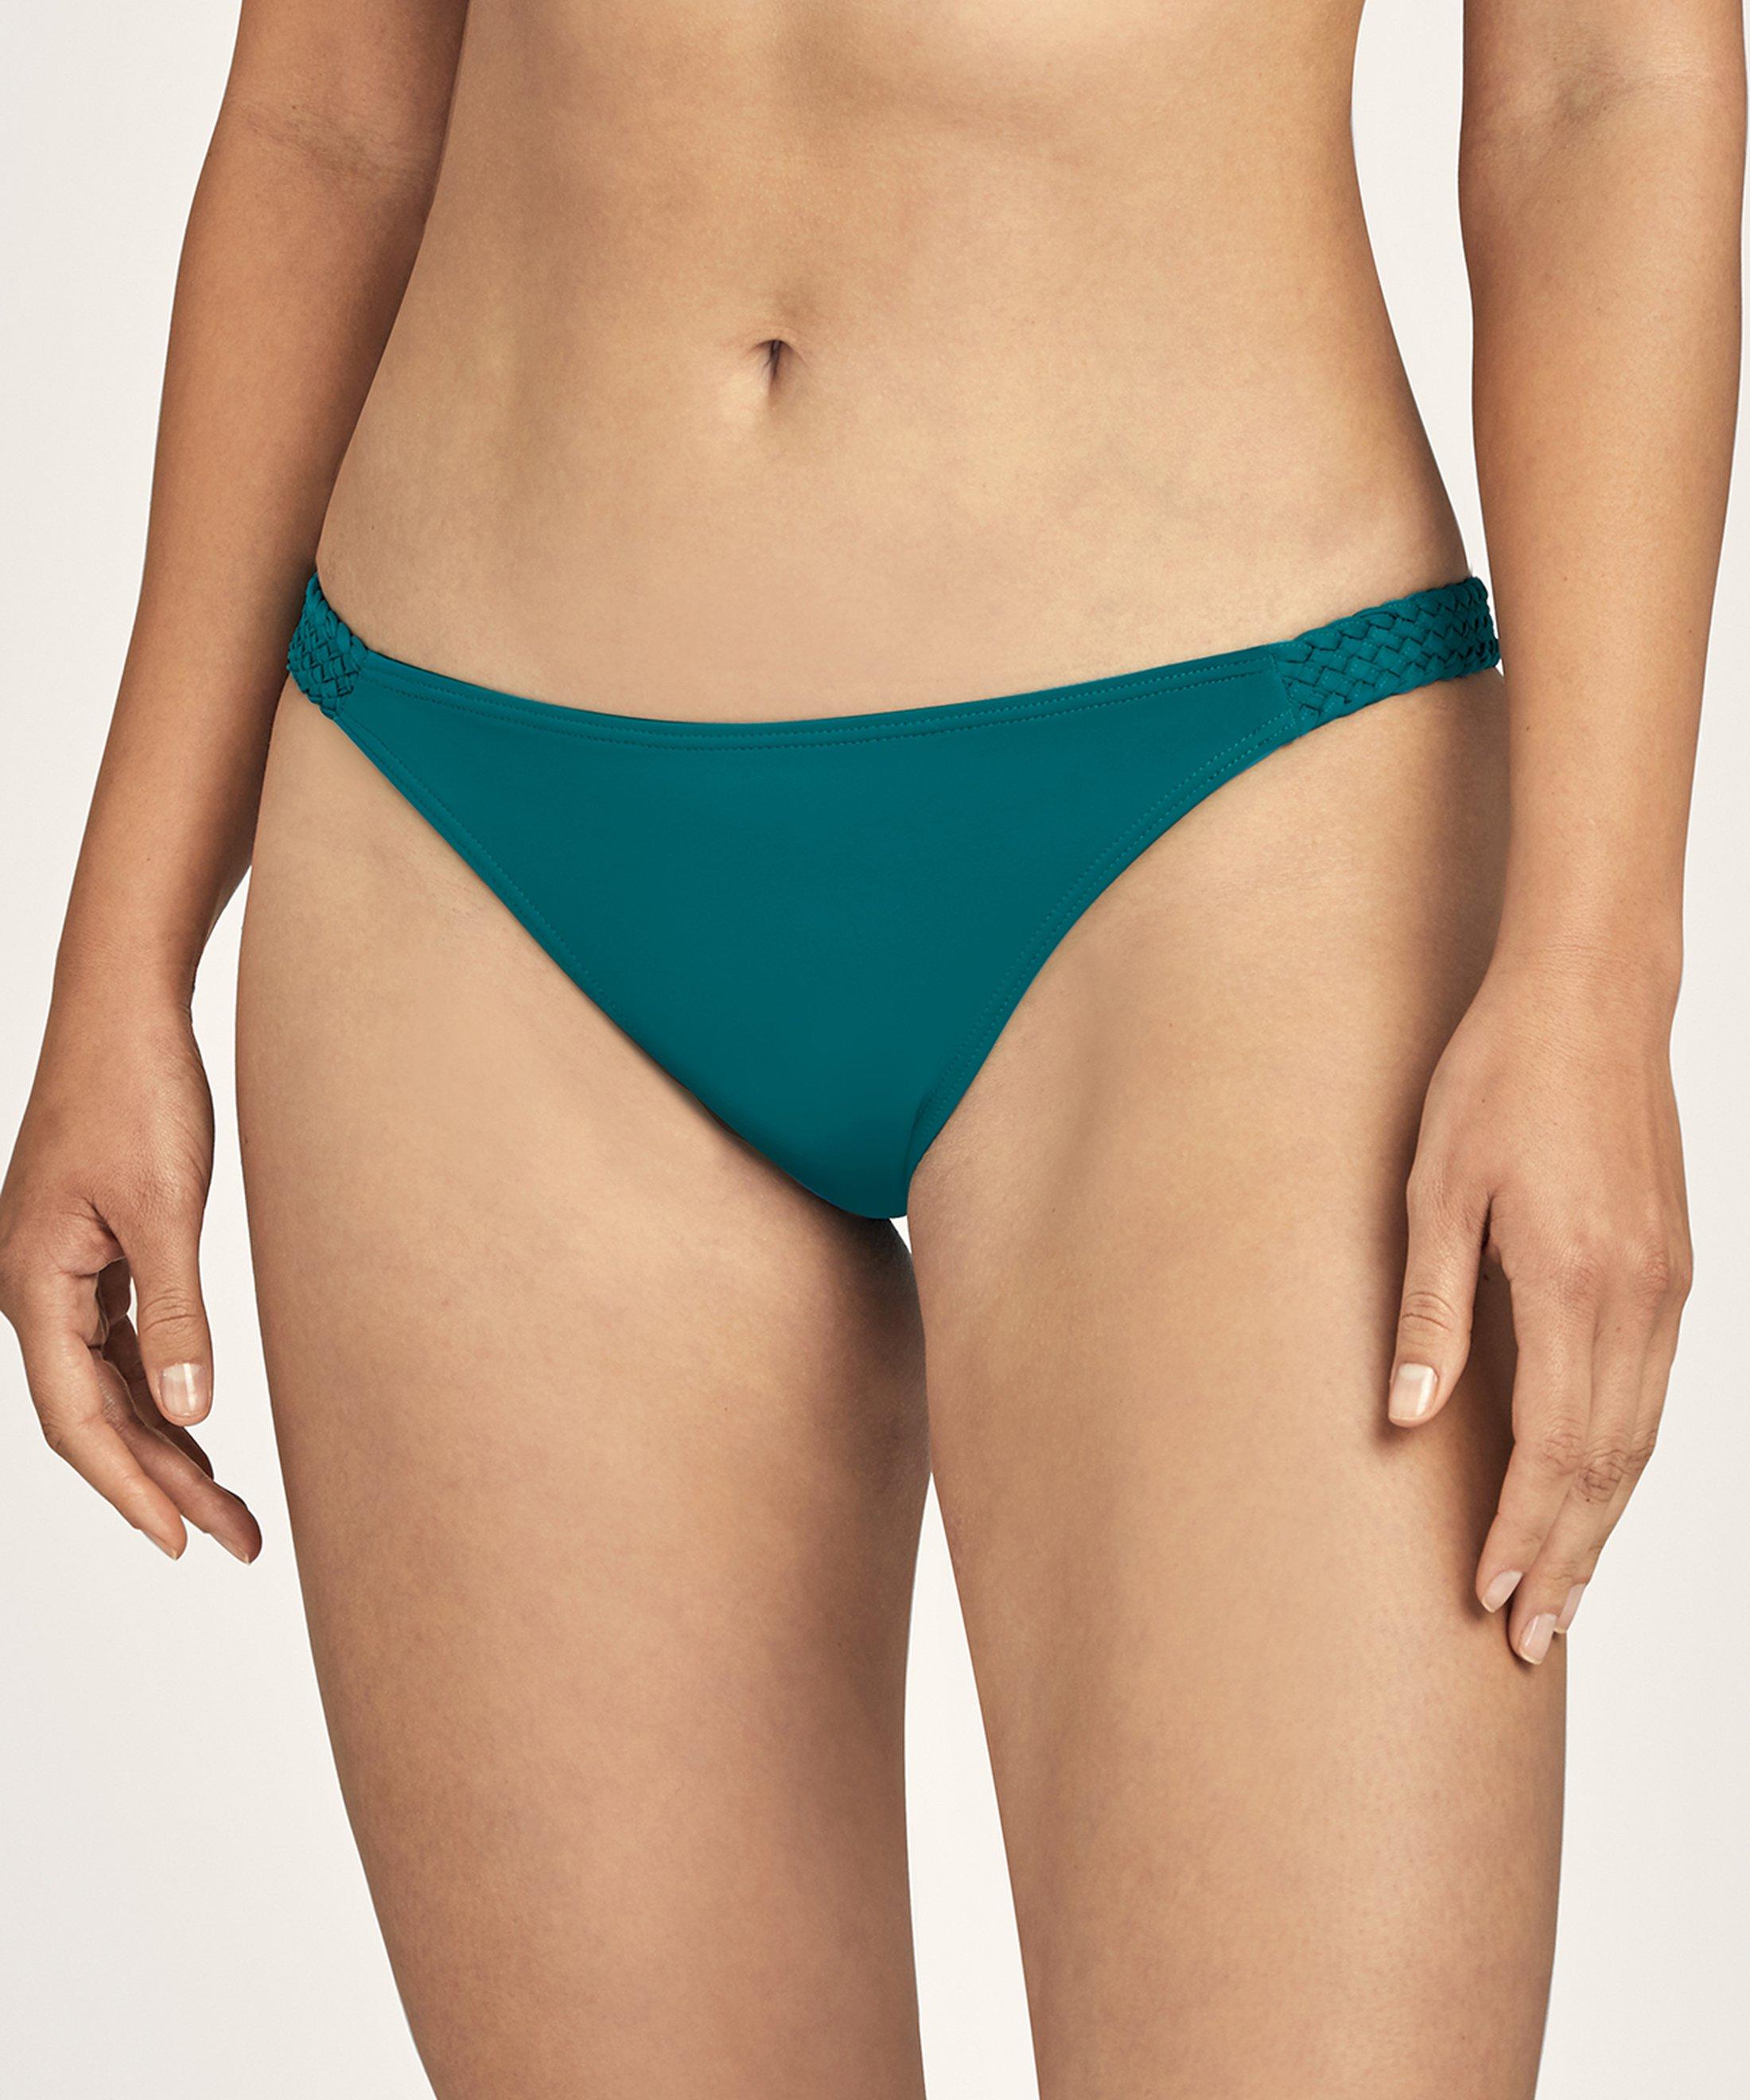 LA PLAGE ENSOLEILLÉE Mini-coeur bikini bottom Mineral Green | Aubade